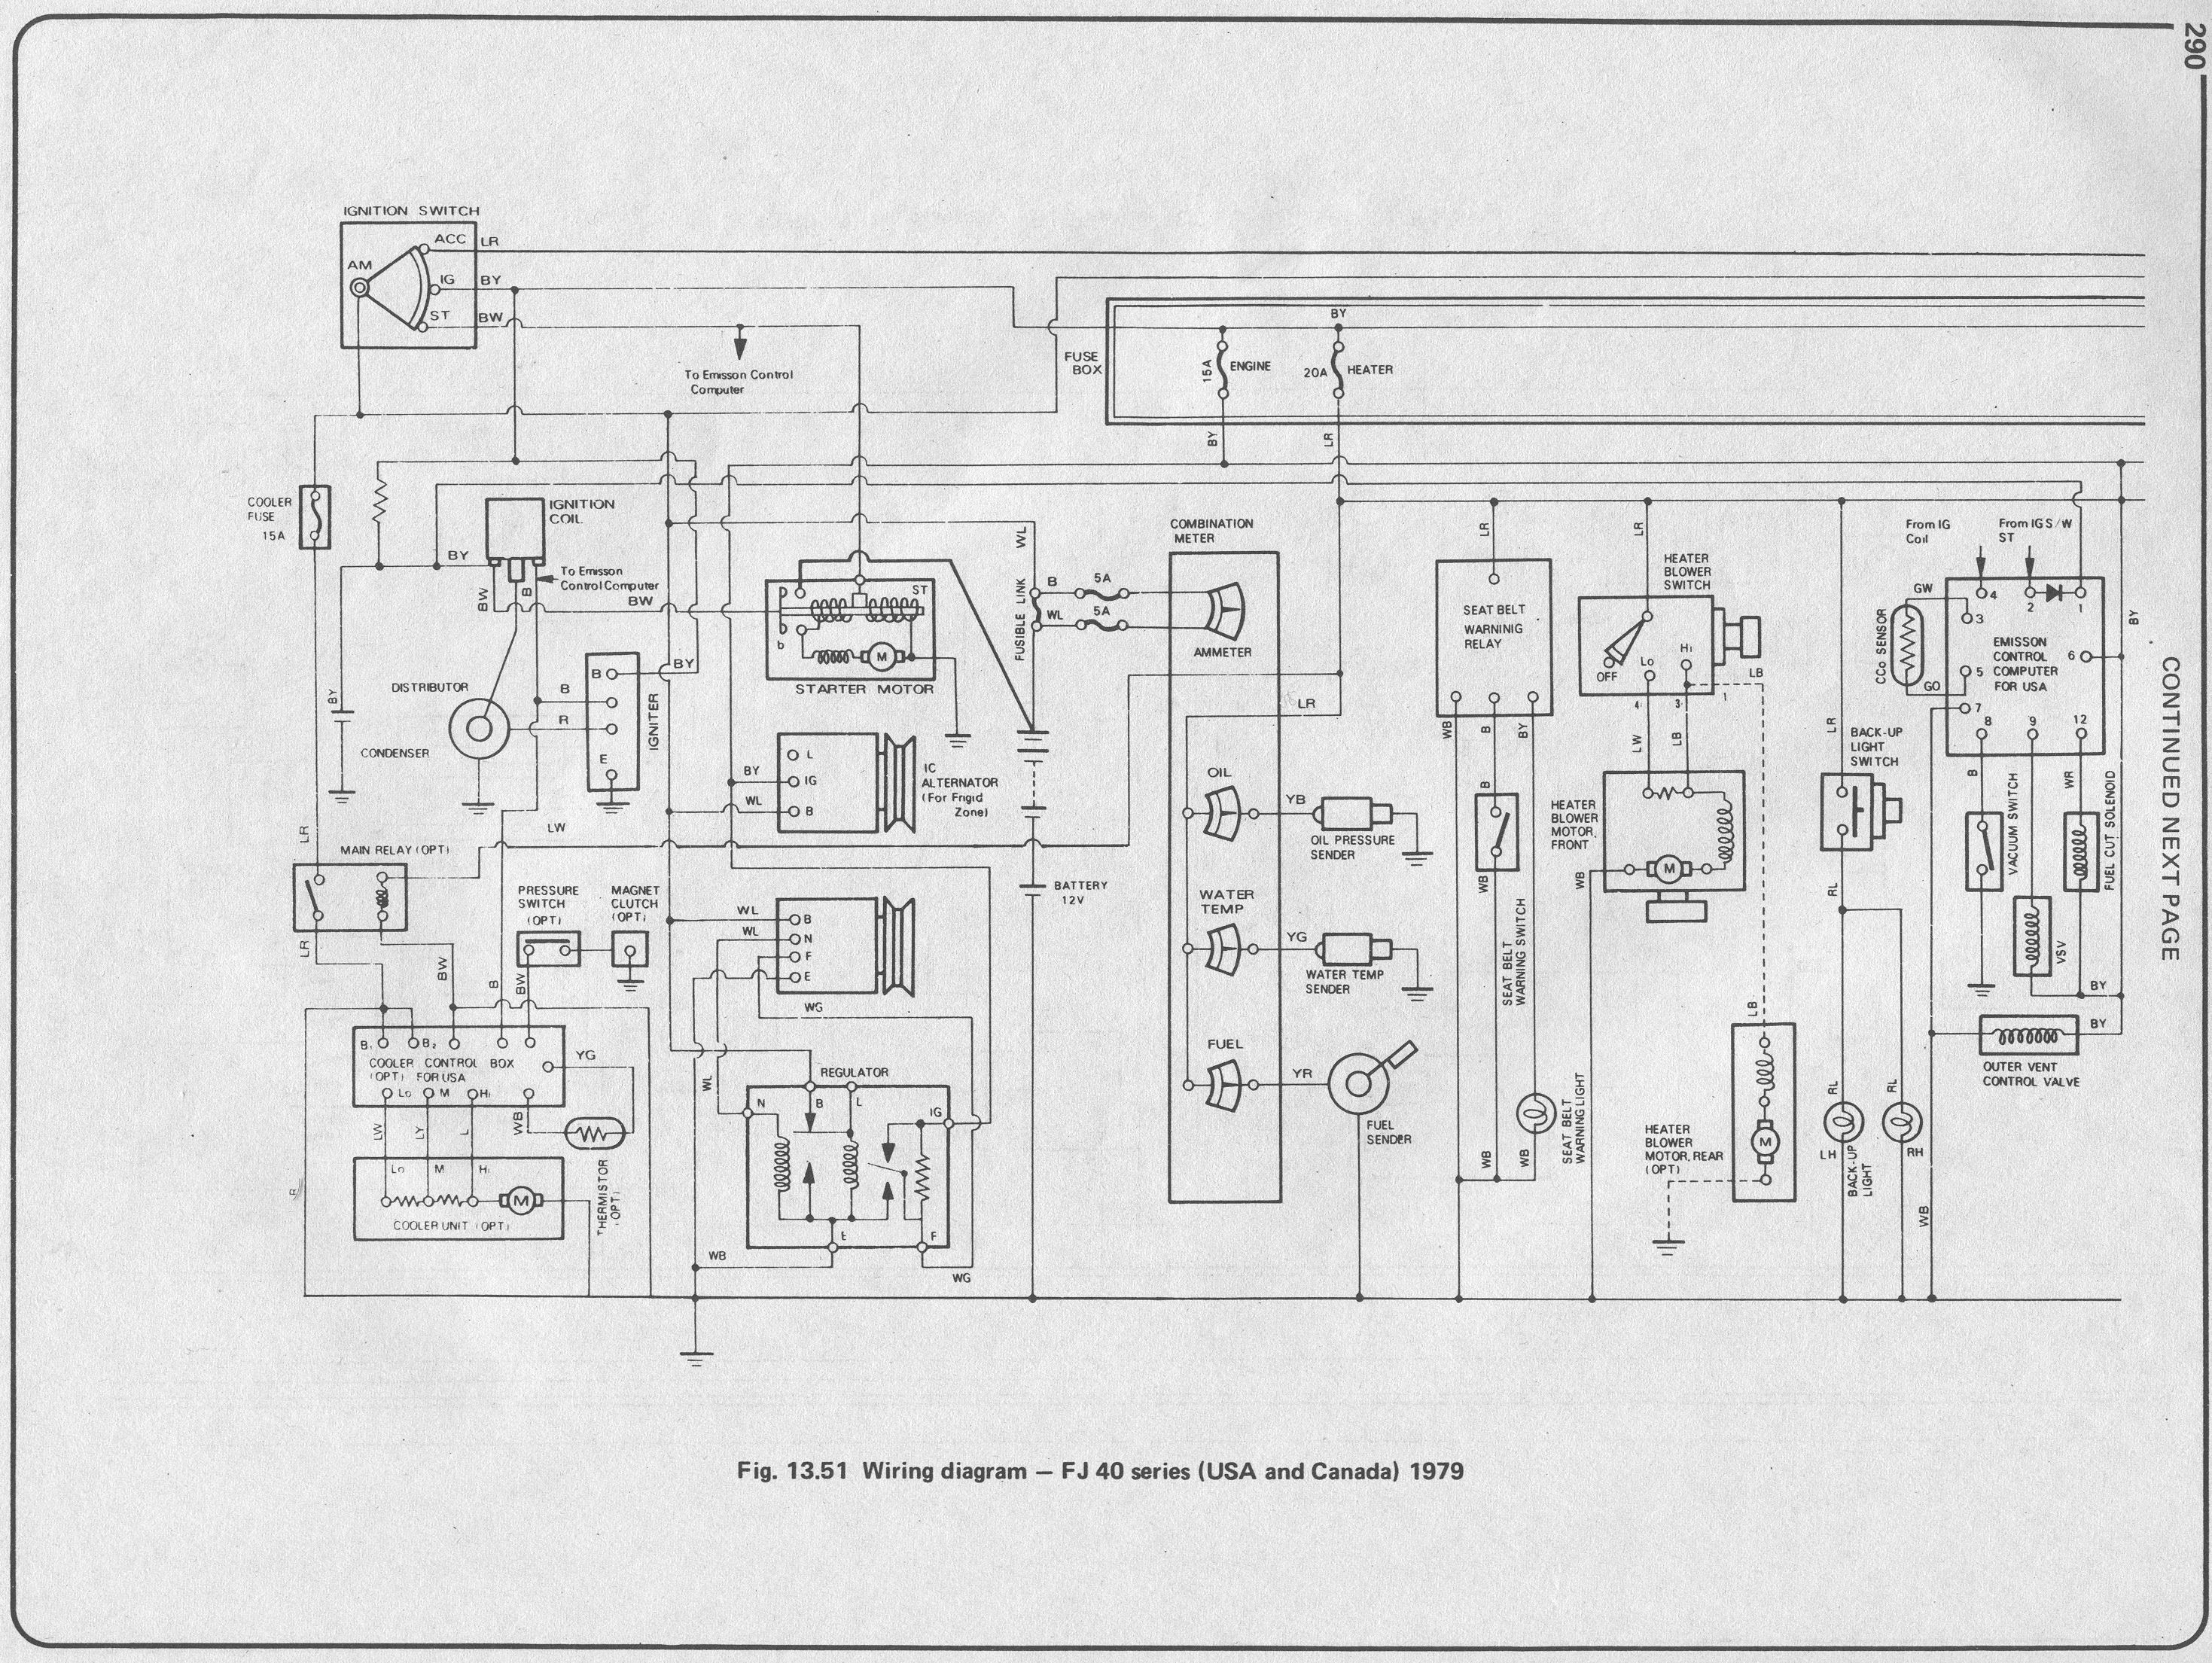 1976 toyota celica wiring diagram